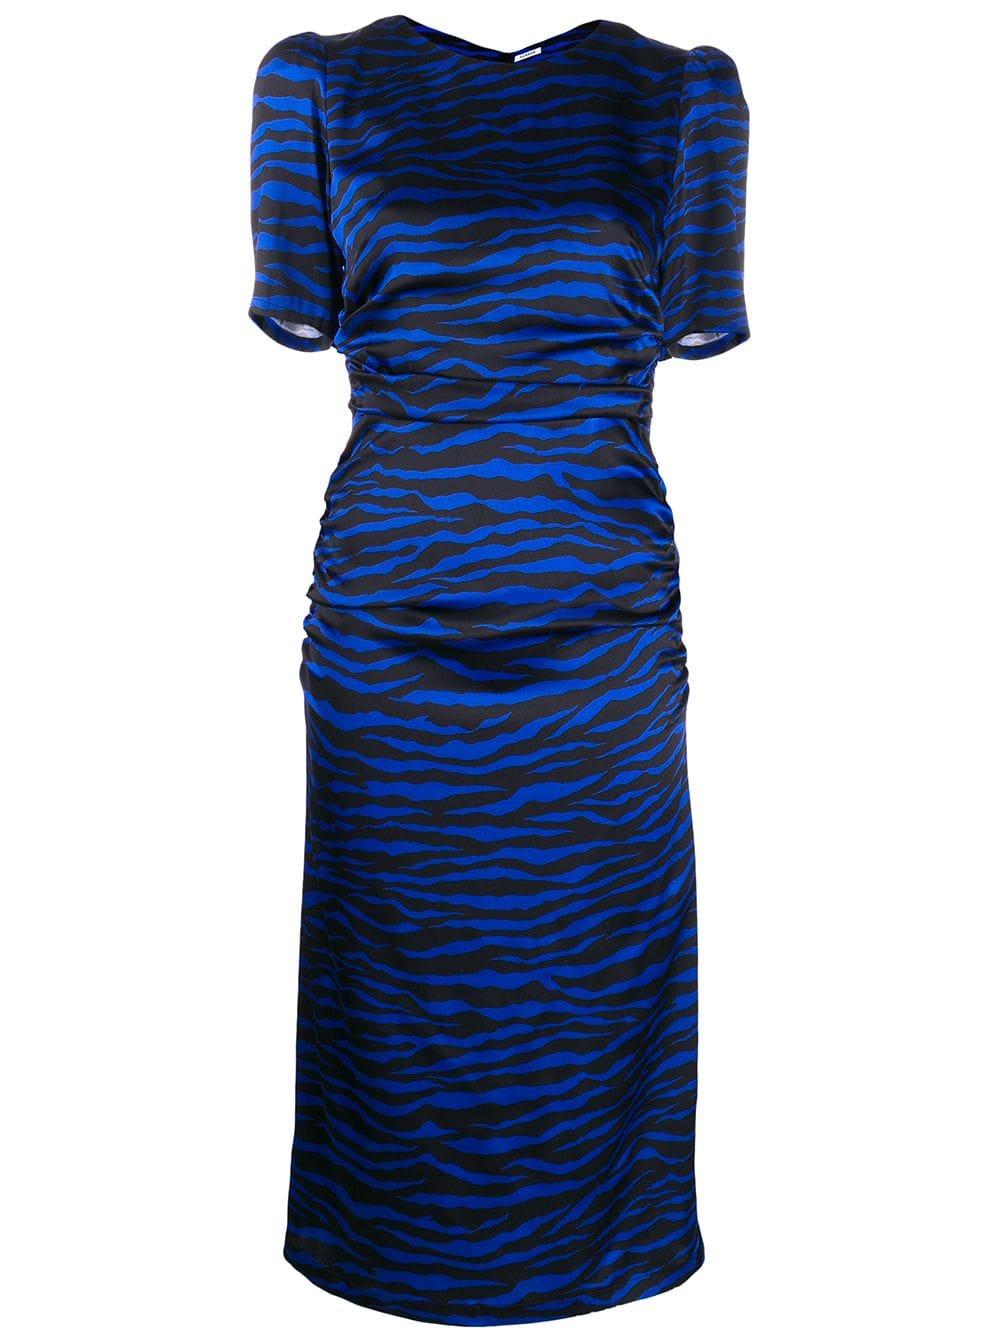 Parosh Printed Zebra Satin Dress